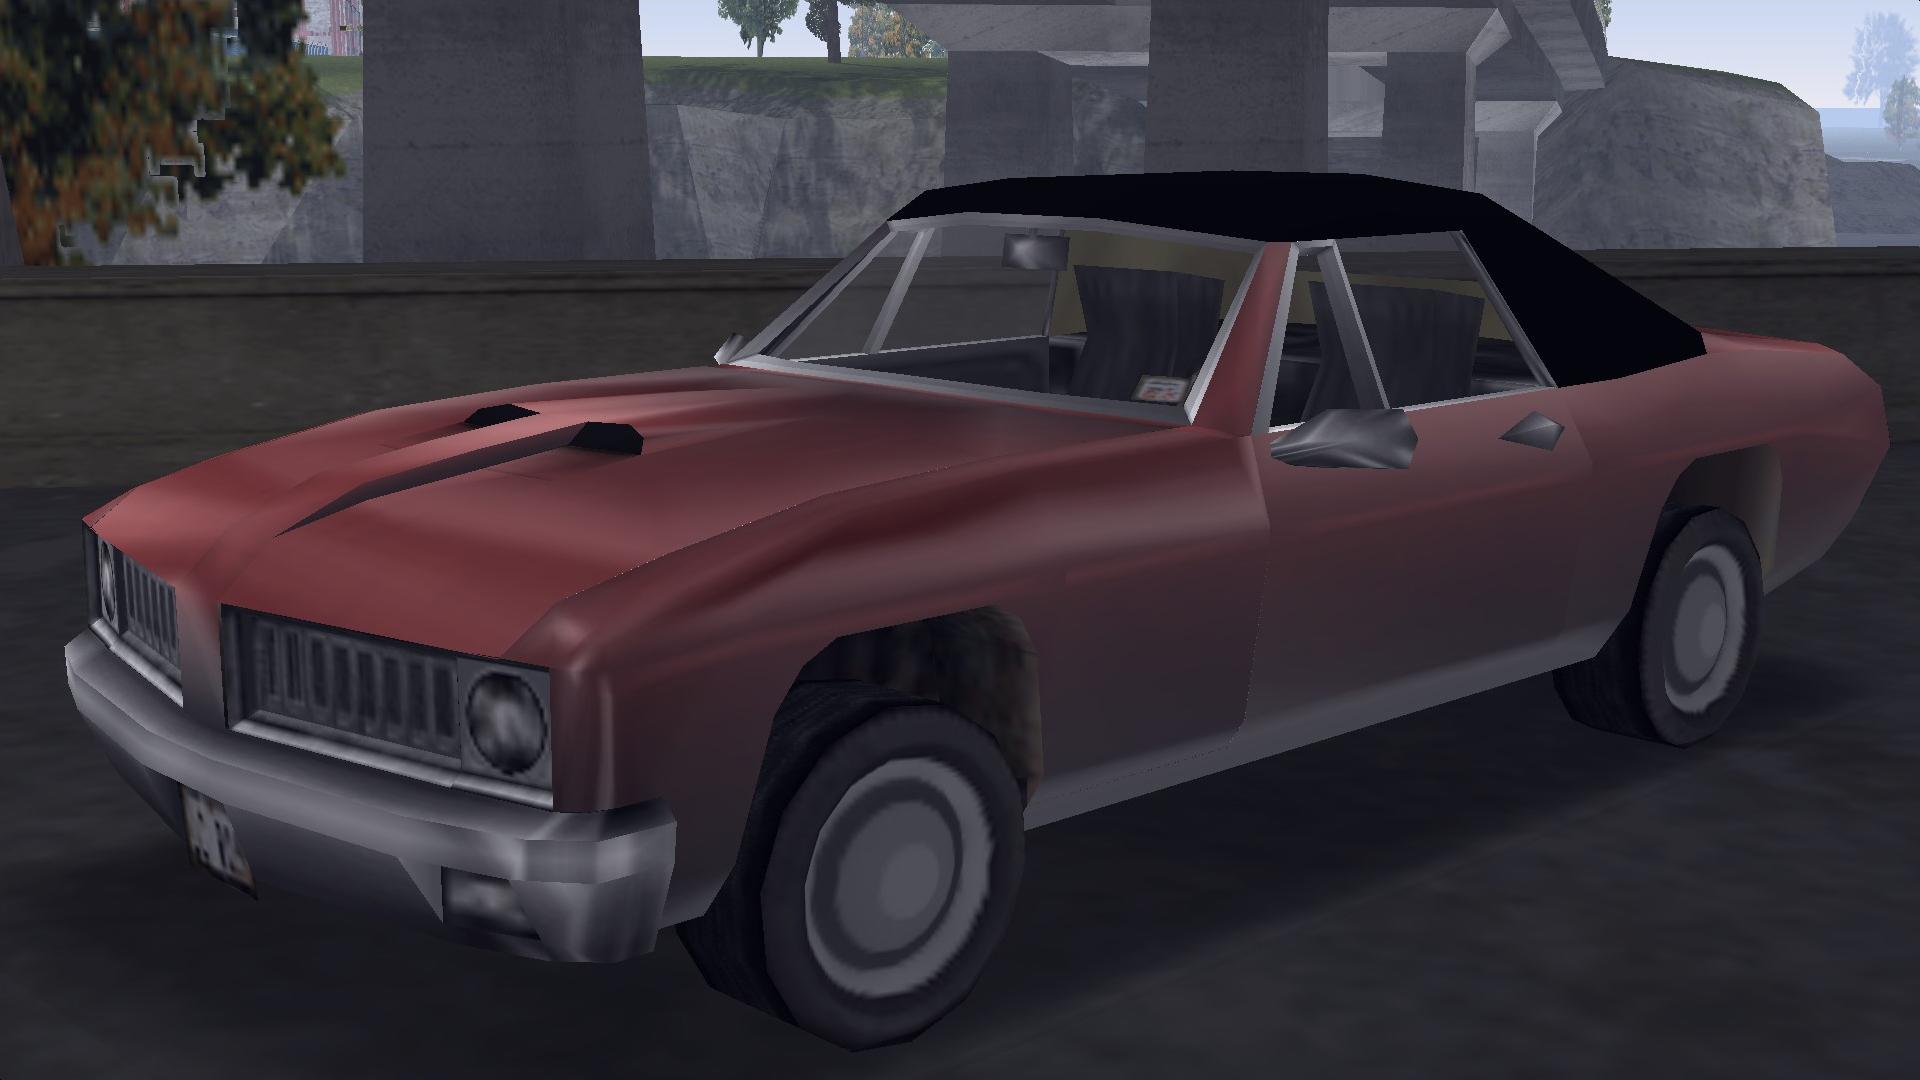 Stallion-GTA3-front.jpg